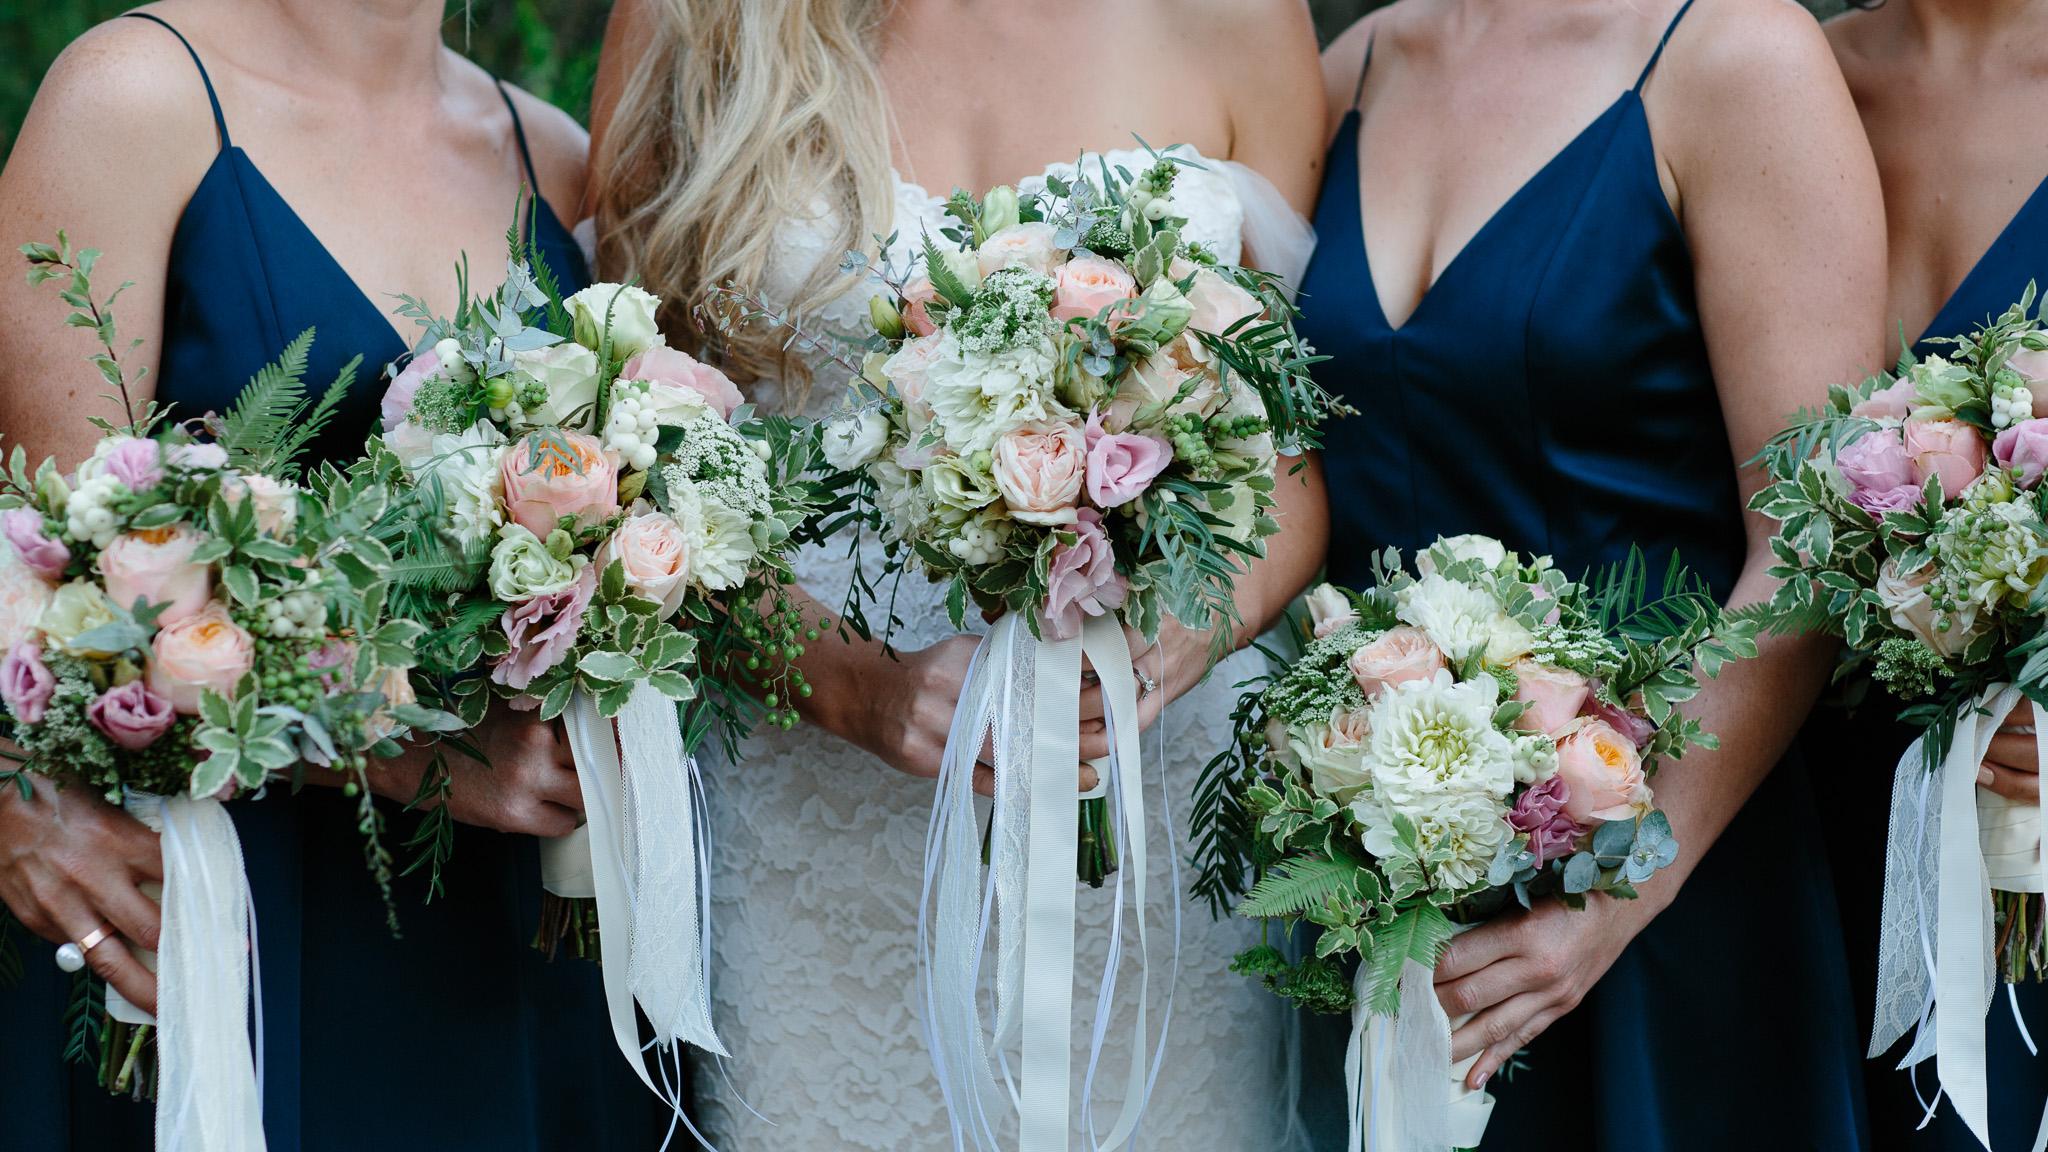 Busselton wedding-bridsmaids bouquets.jpg